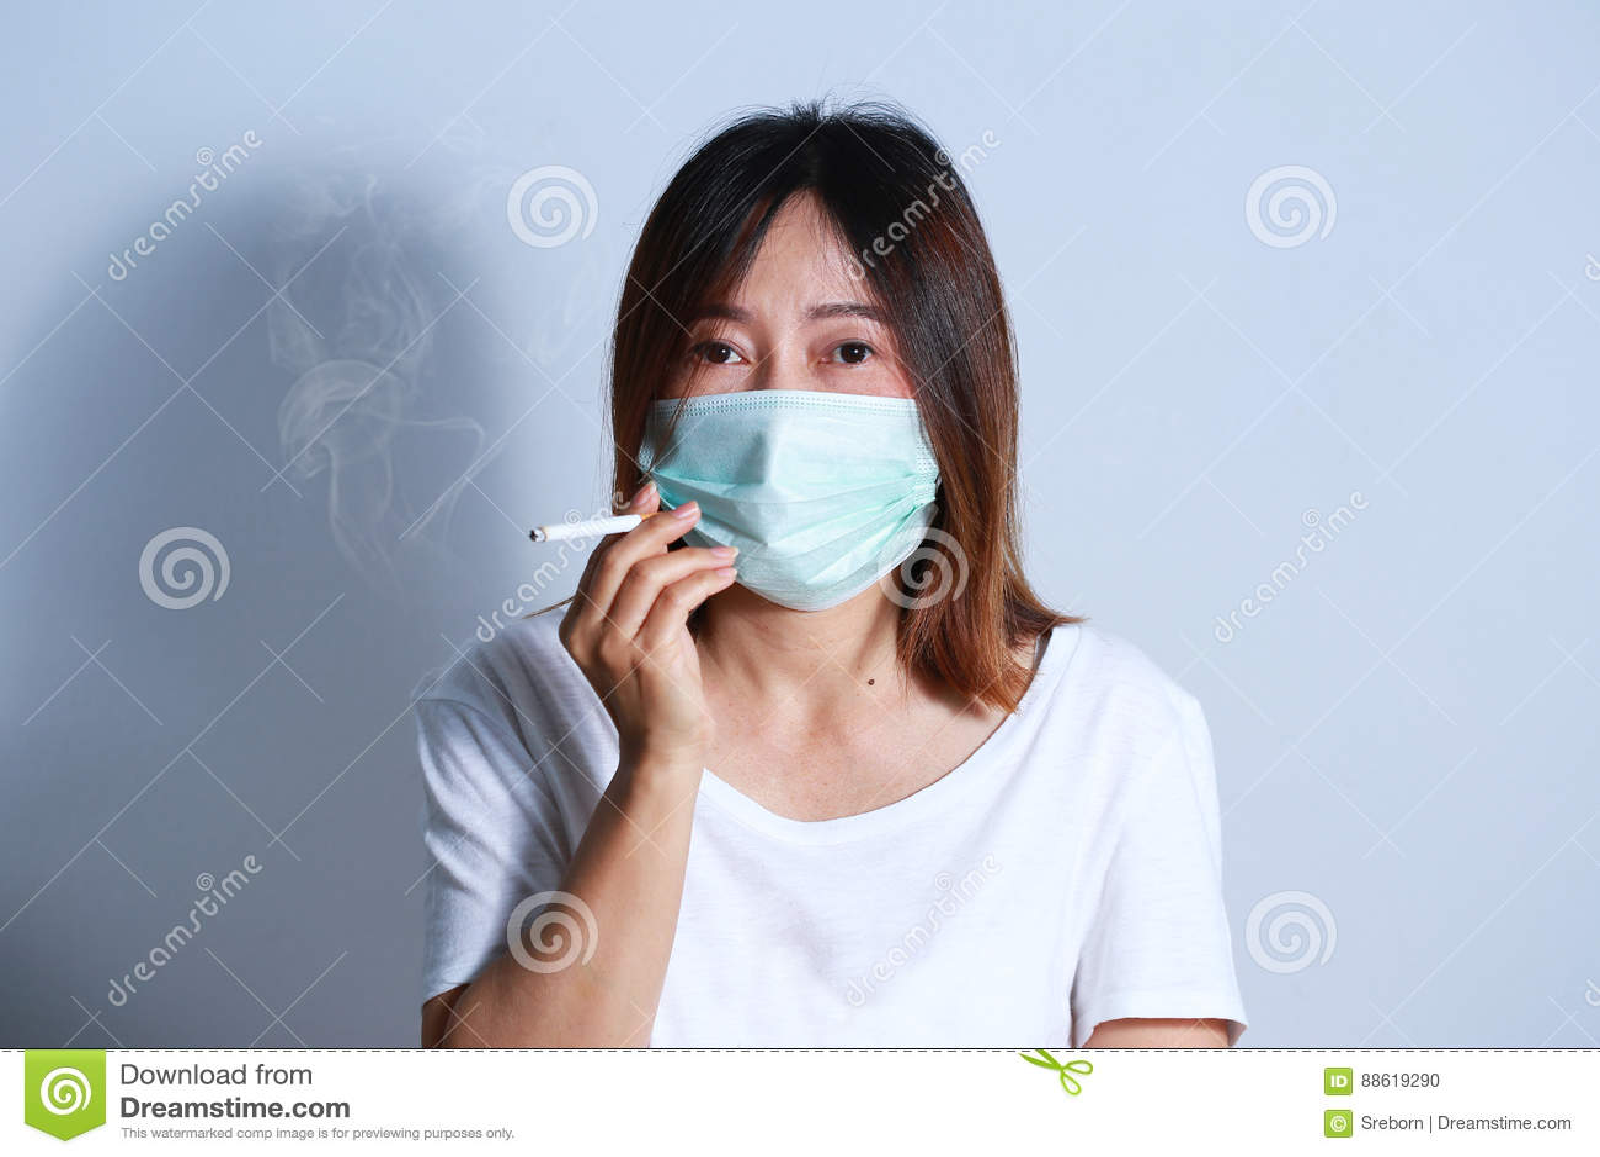 masque anti tabac